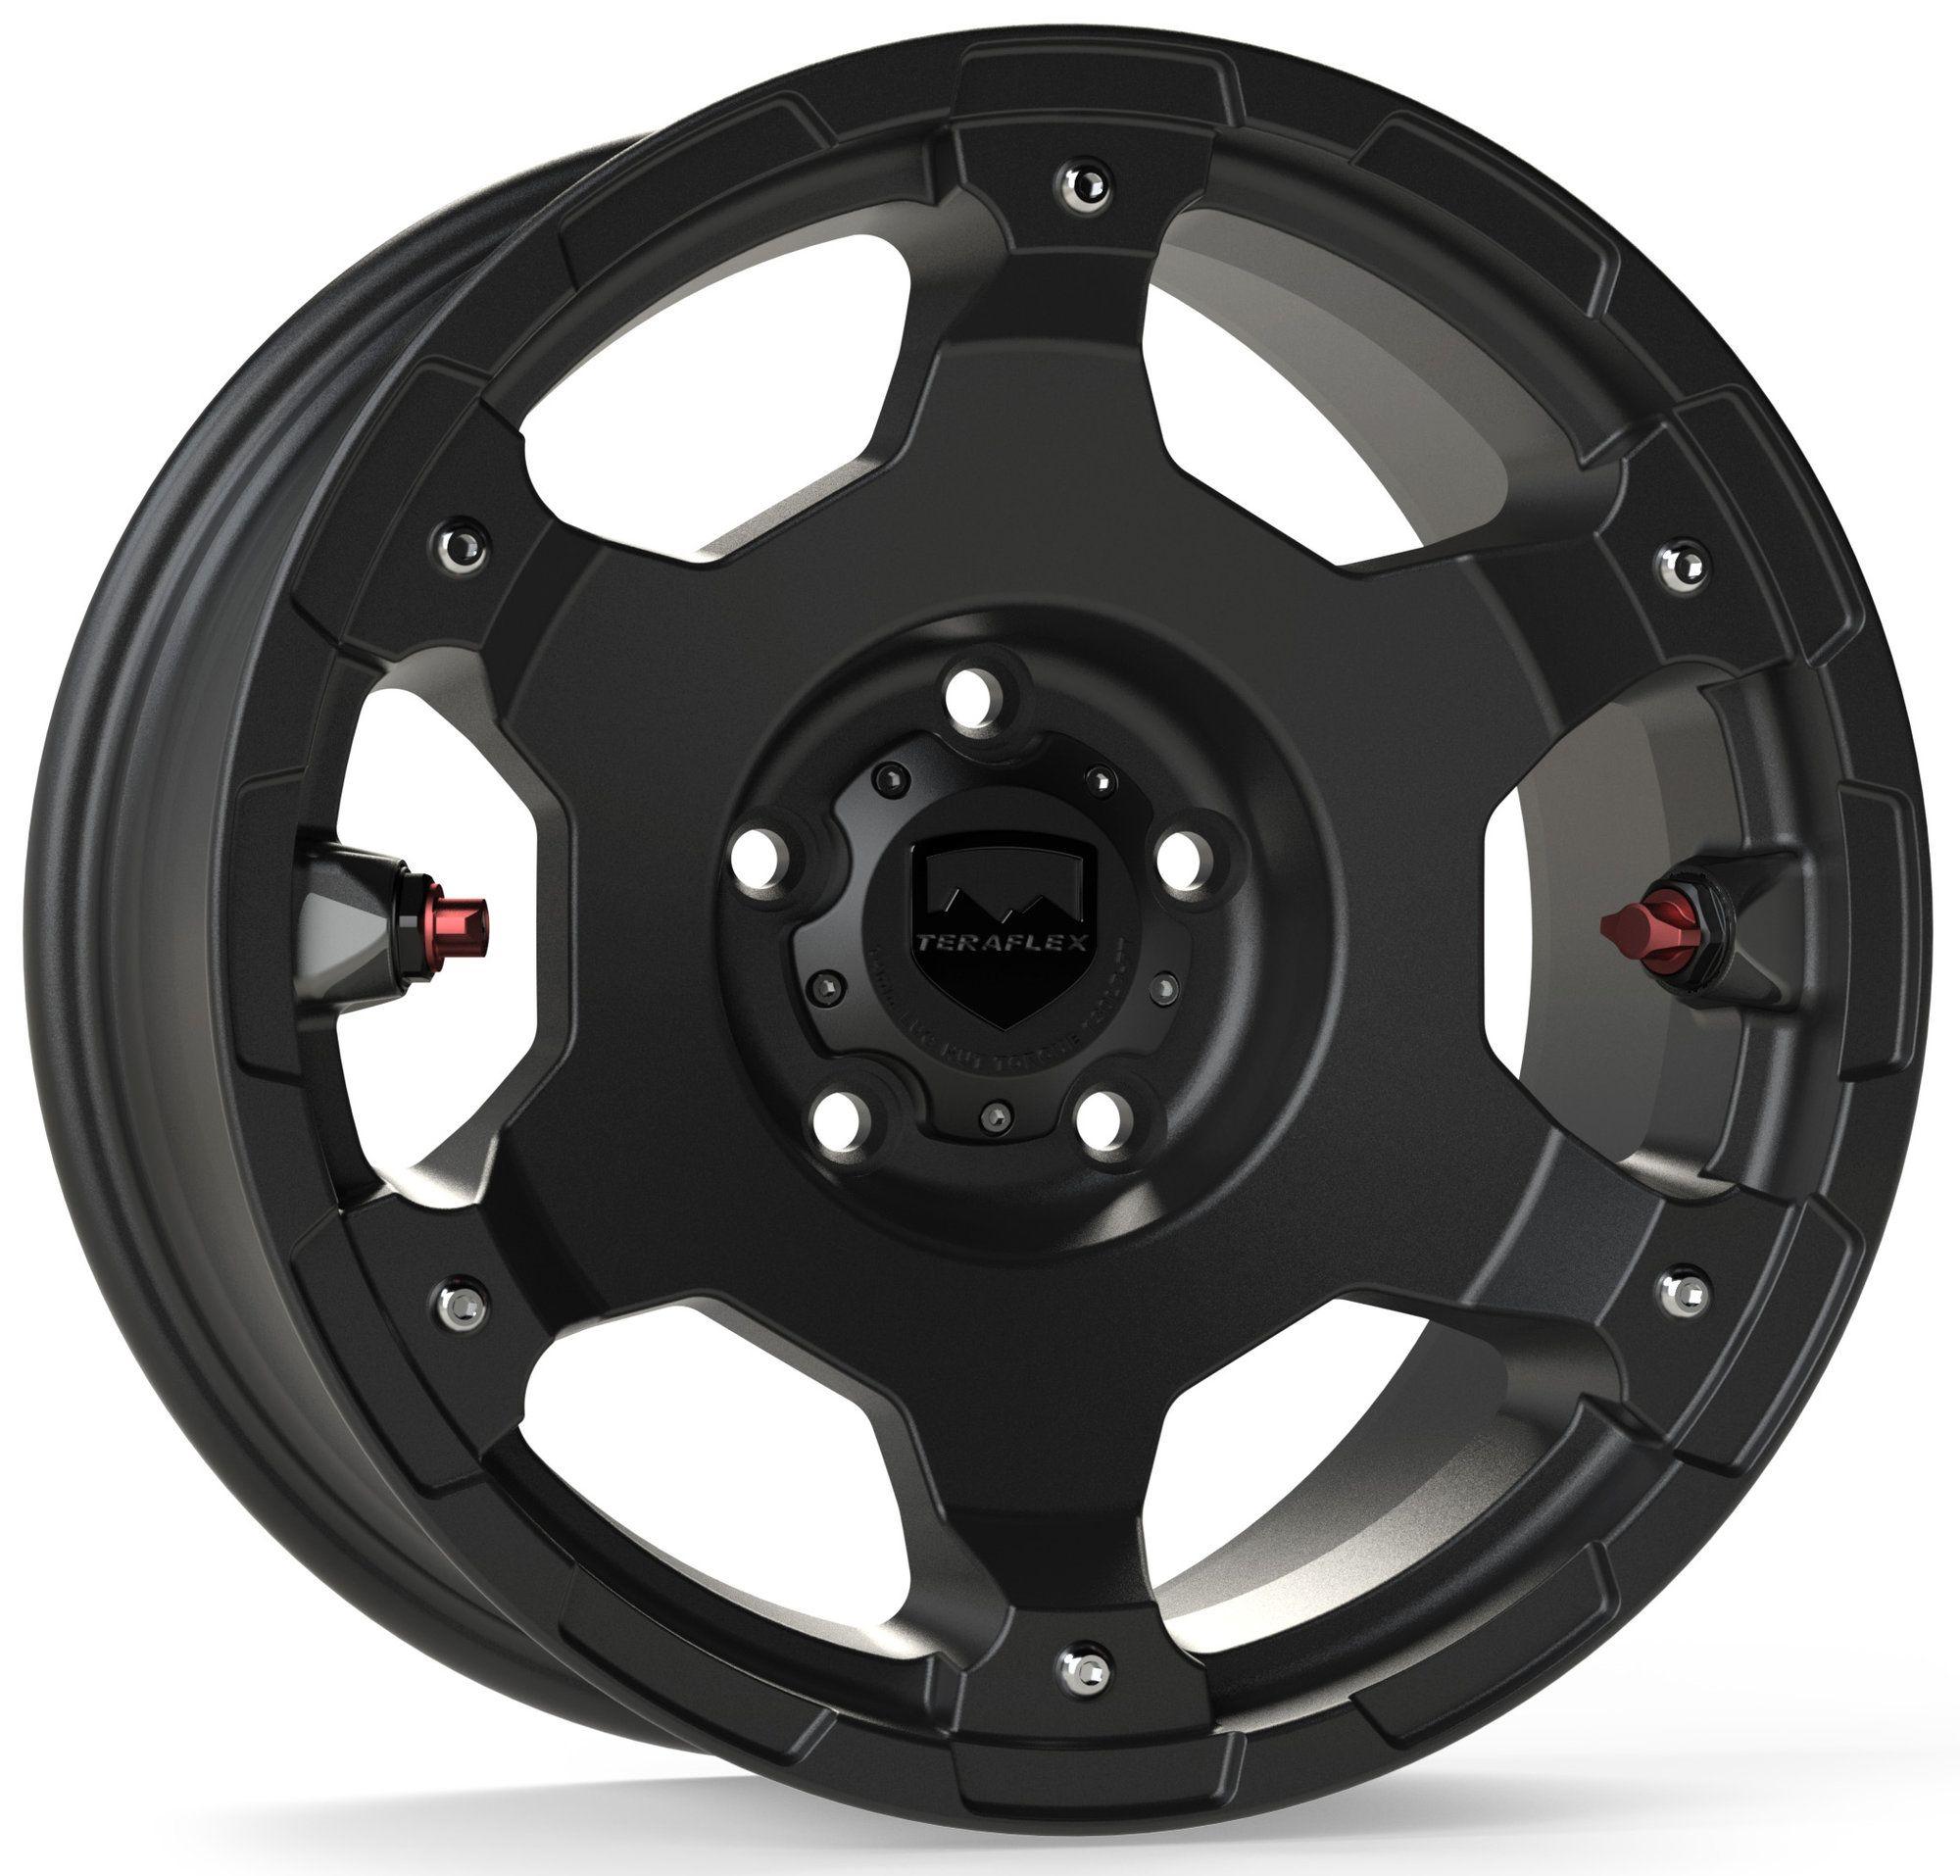 Teraflex Base Nomad Wheel in Metallic Black for 0720 Jeep